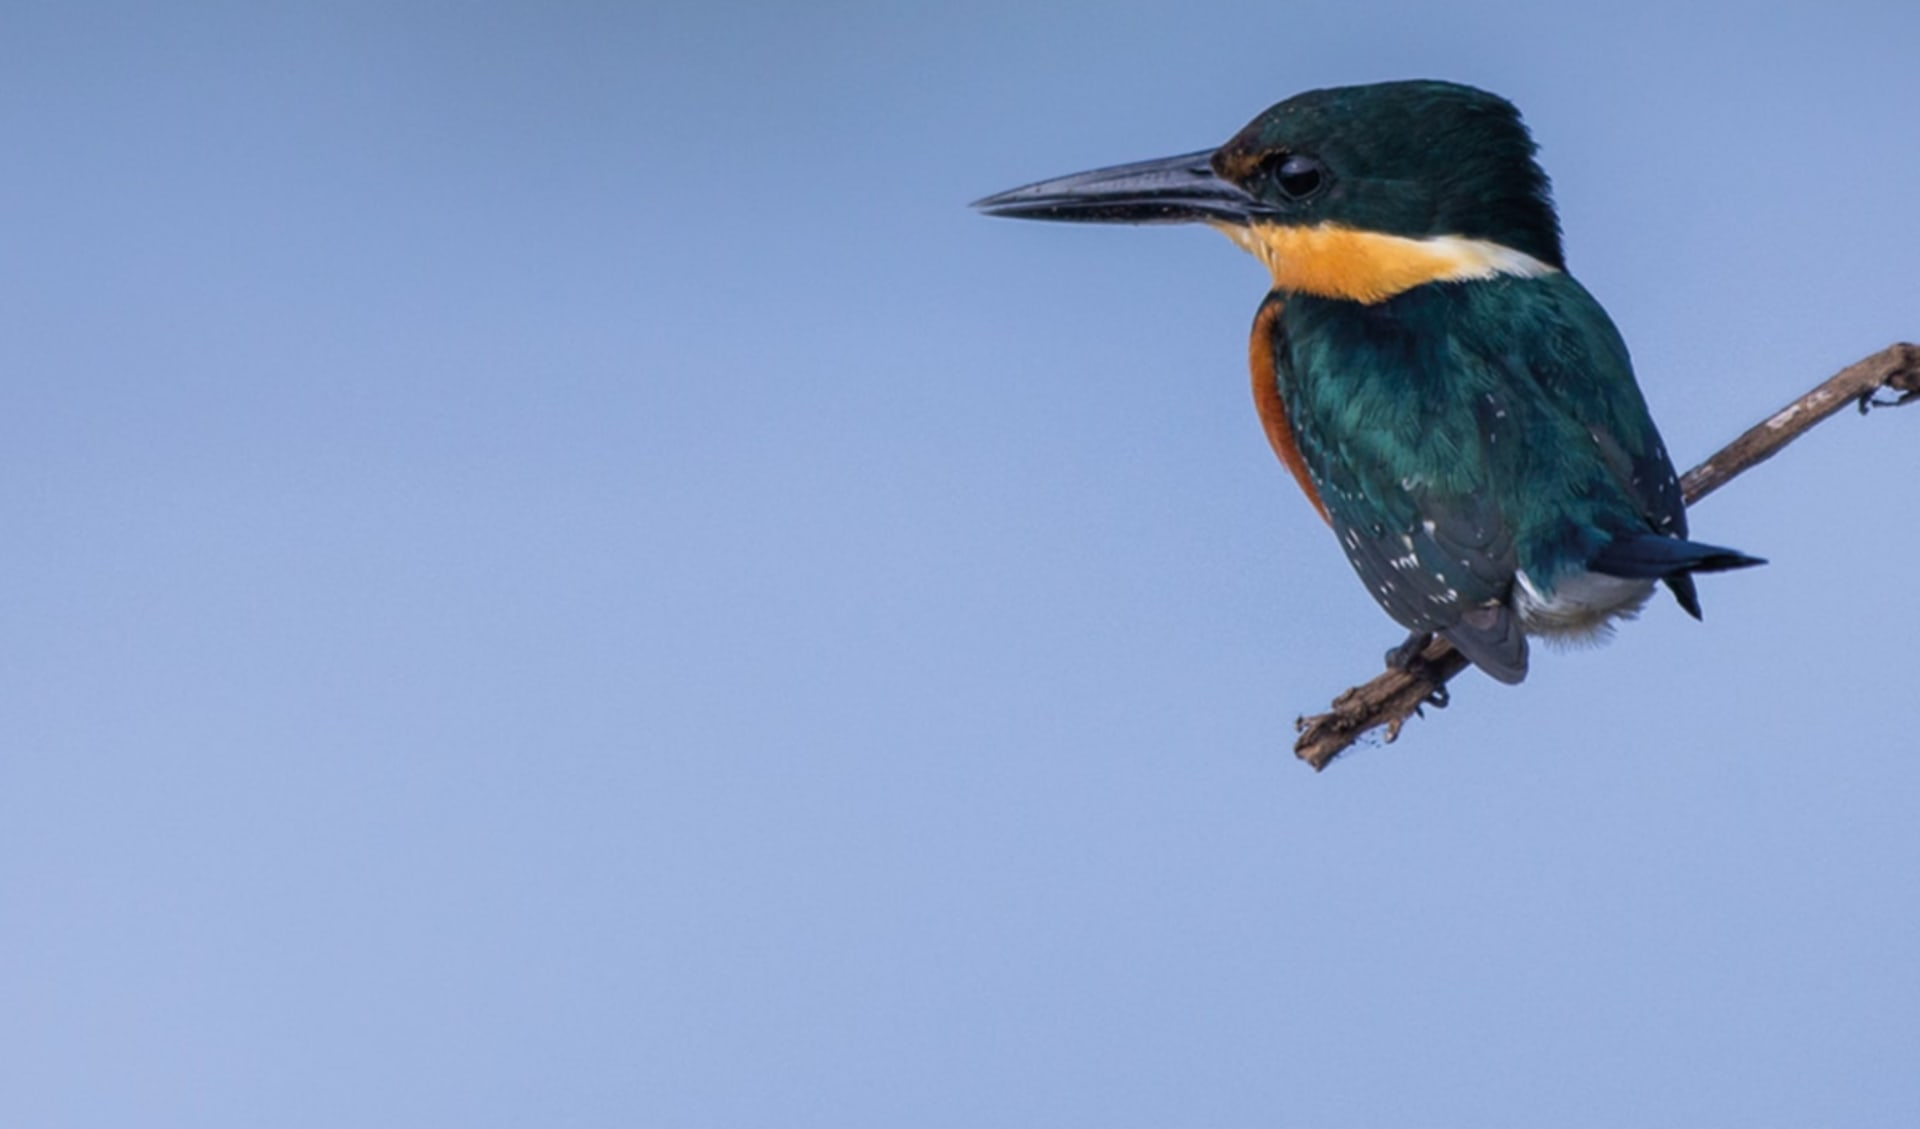 Privatreise Karibik mal anders ab San José City: Costa Rica - Amerikanischer pygmy kingfisher